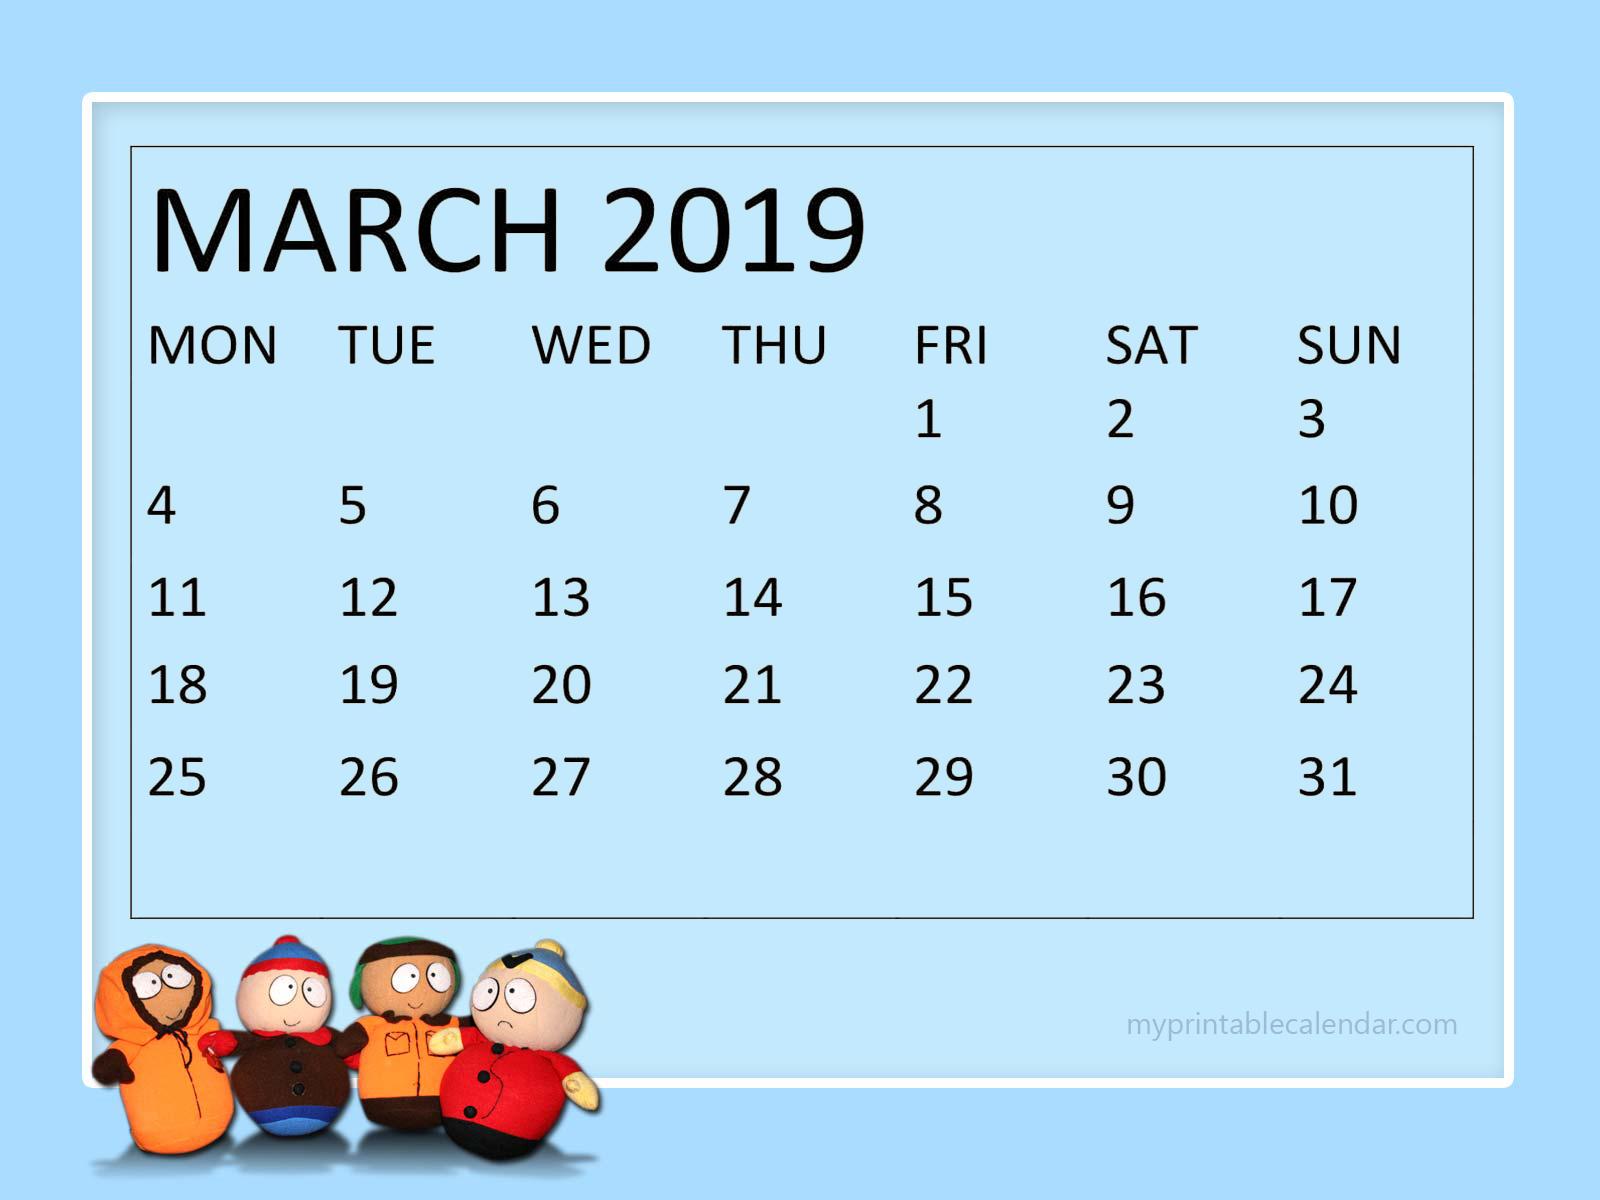 Floral March 2019 Wall Calendar   Printable Calendar Templates 1600x1200